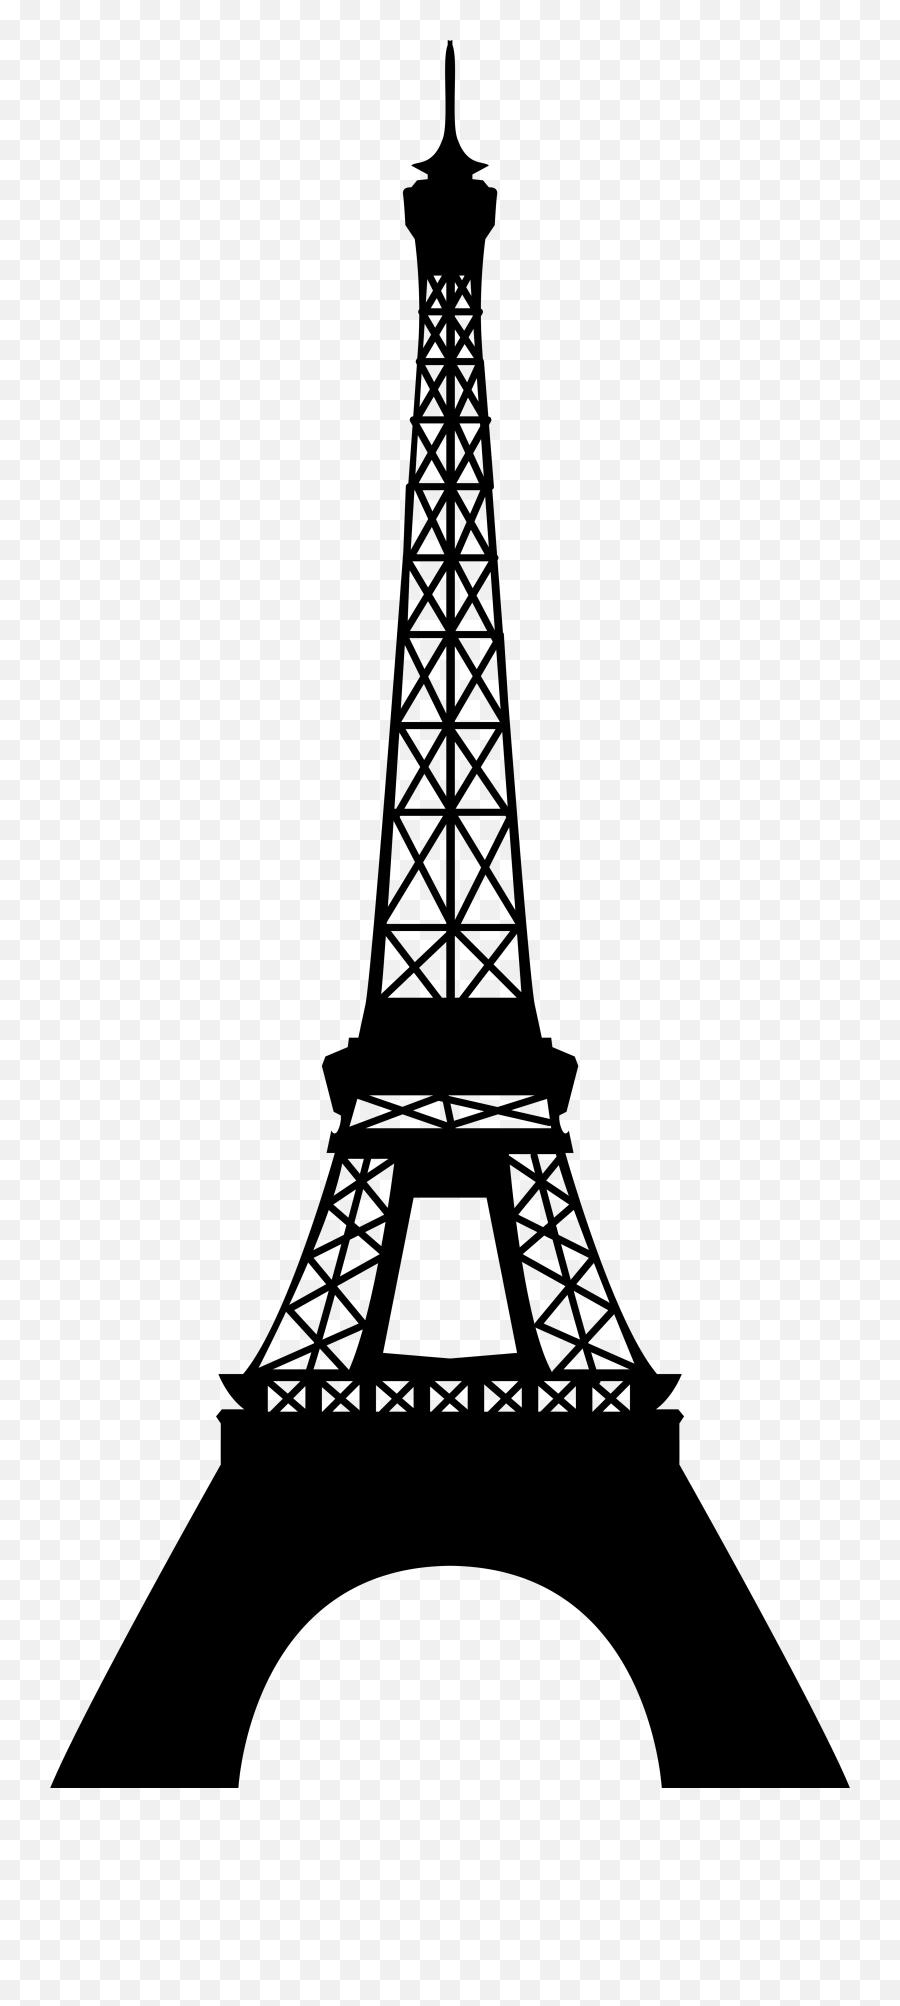 Eiffel Tower Clipart No Background - Eiffel Tower Silhouette Png Emoji,Eiffel Tower Emoji